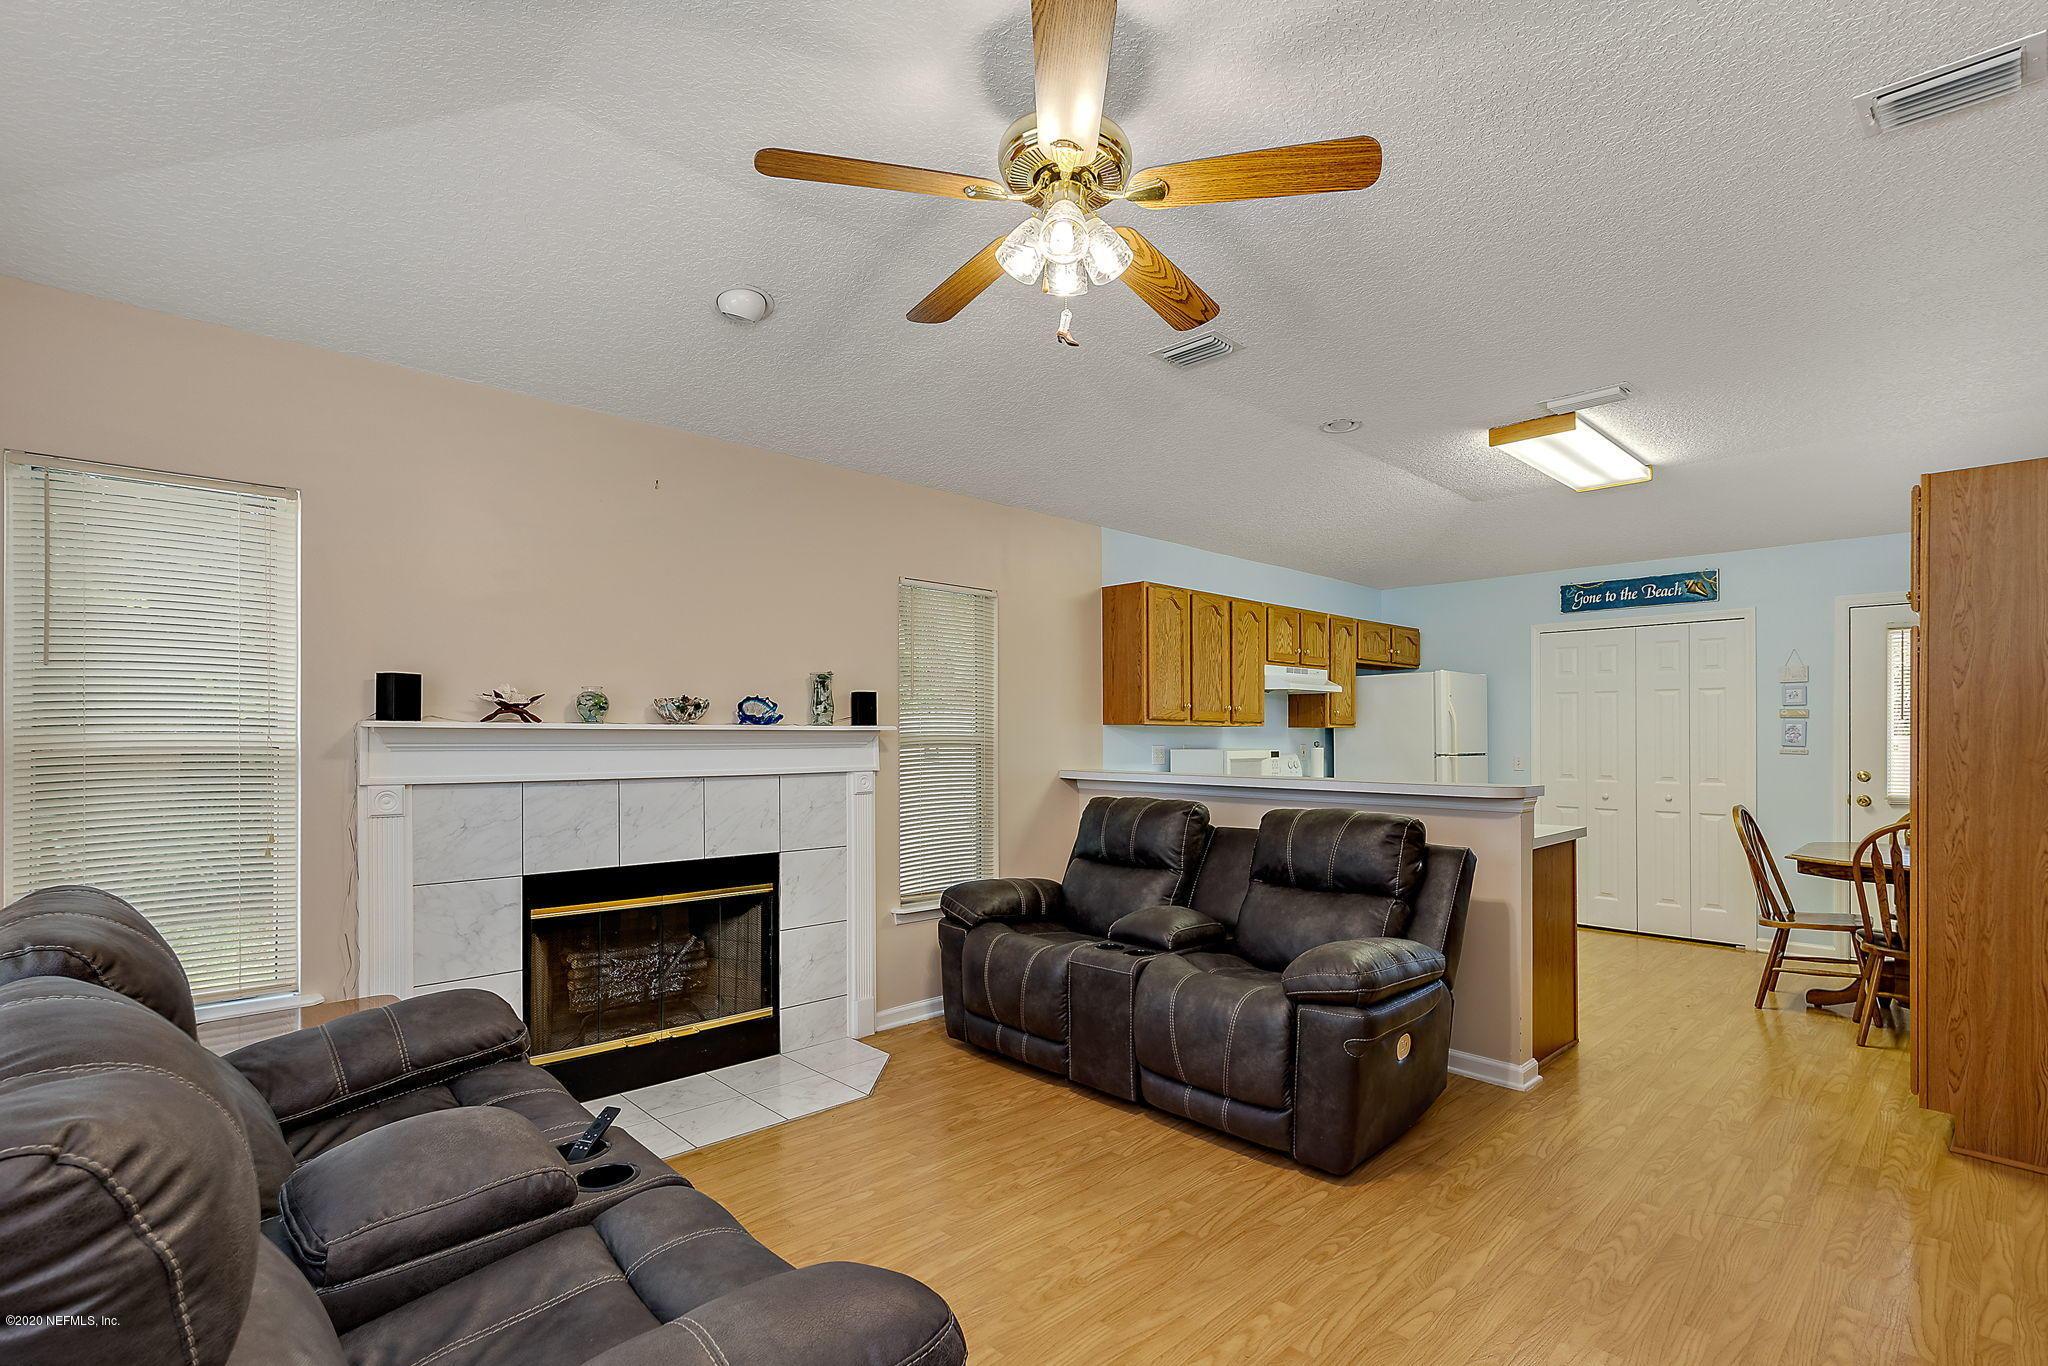 351 LINDEN, ORANGE PARK, FLORIDA 32073, 3 Bedrooms Bedrooms, ,2 BathroomsBathrooms,Residential,For sale,LINDEN,1082619